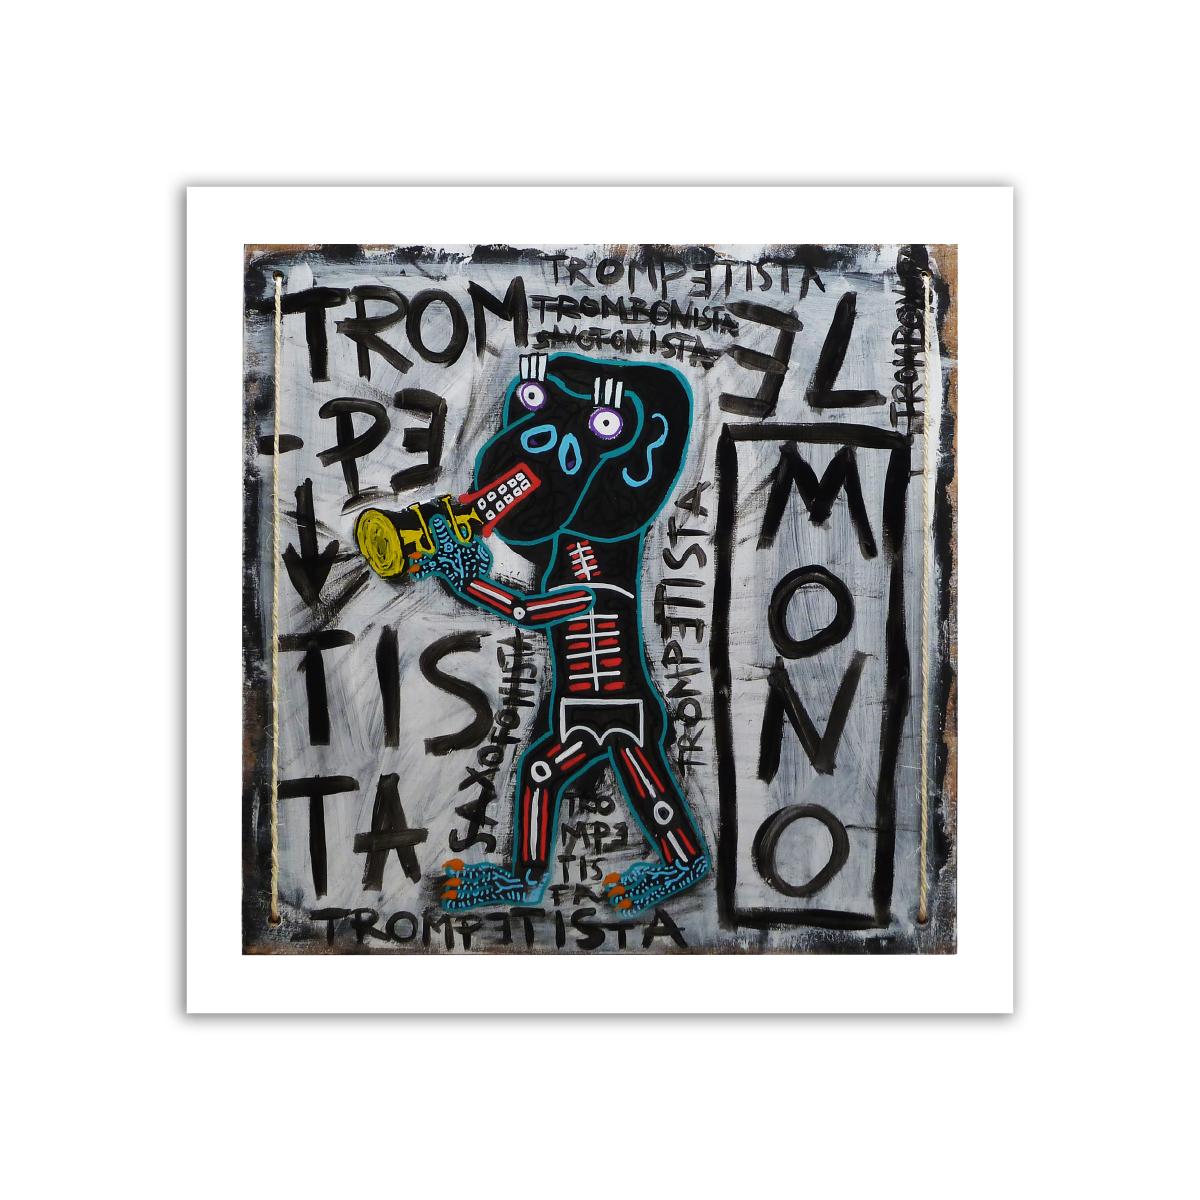 Limited prints - EL MONO TROMPETISTA - Frank Willems